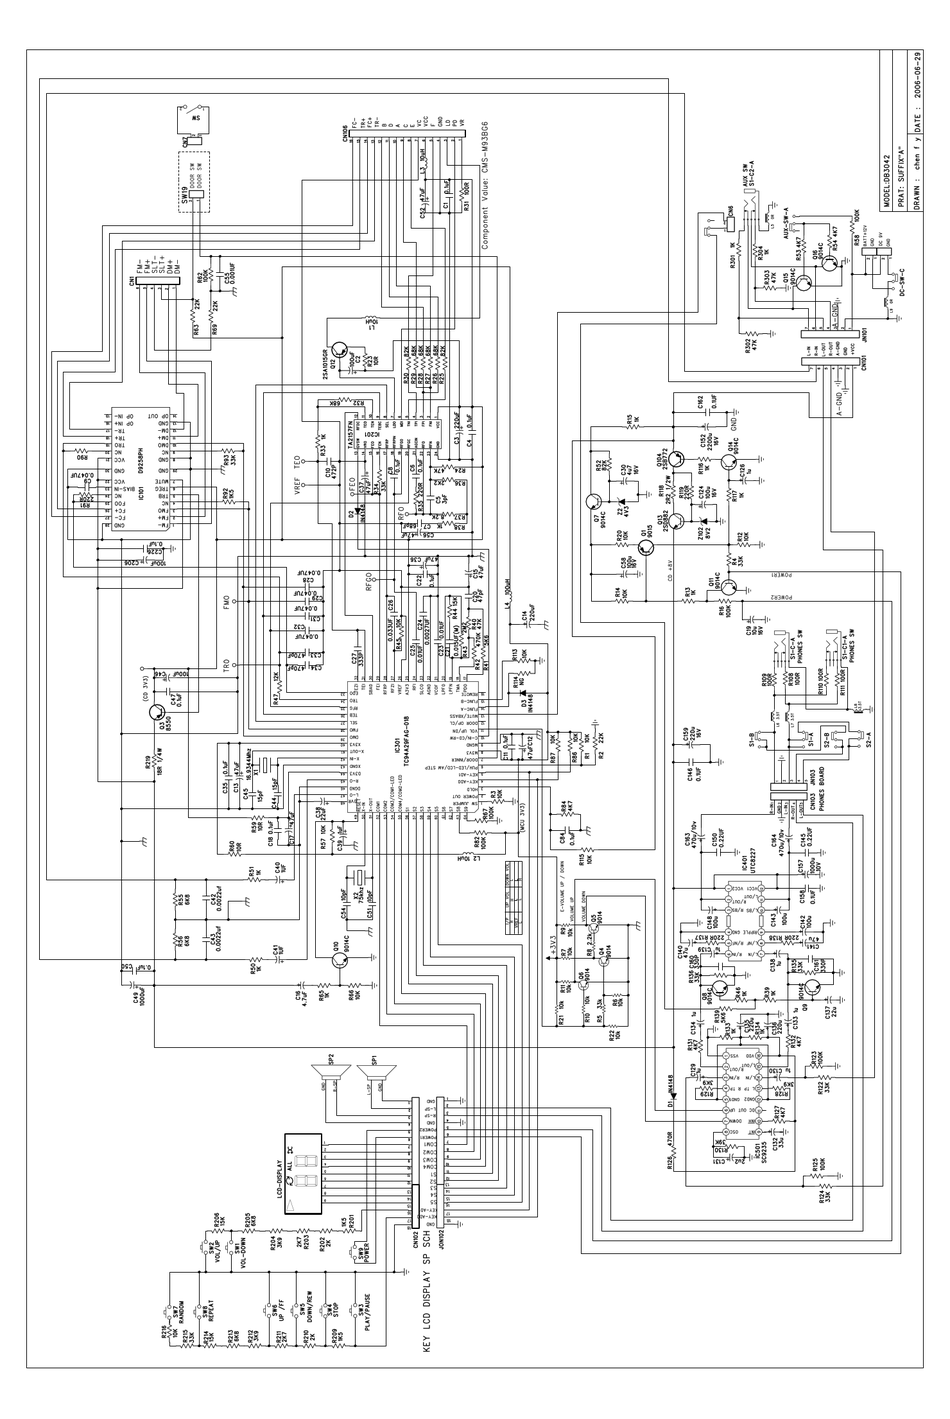 MEMOREX DB3042-MERSM SCHEMATIC DIAGRAMS Pdf Download